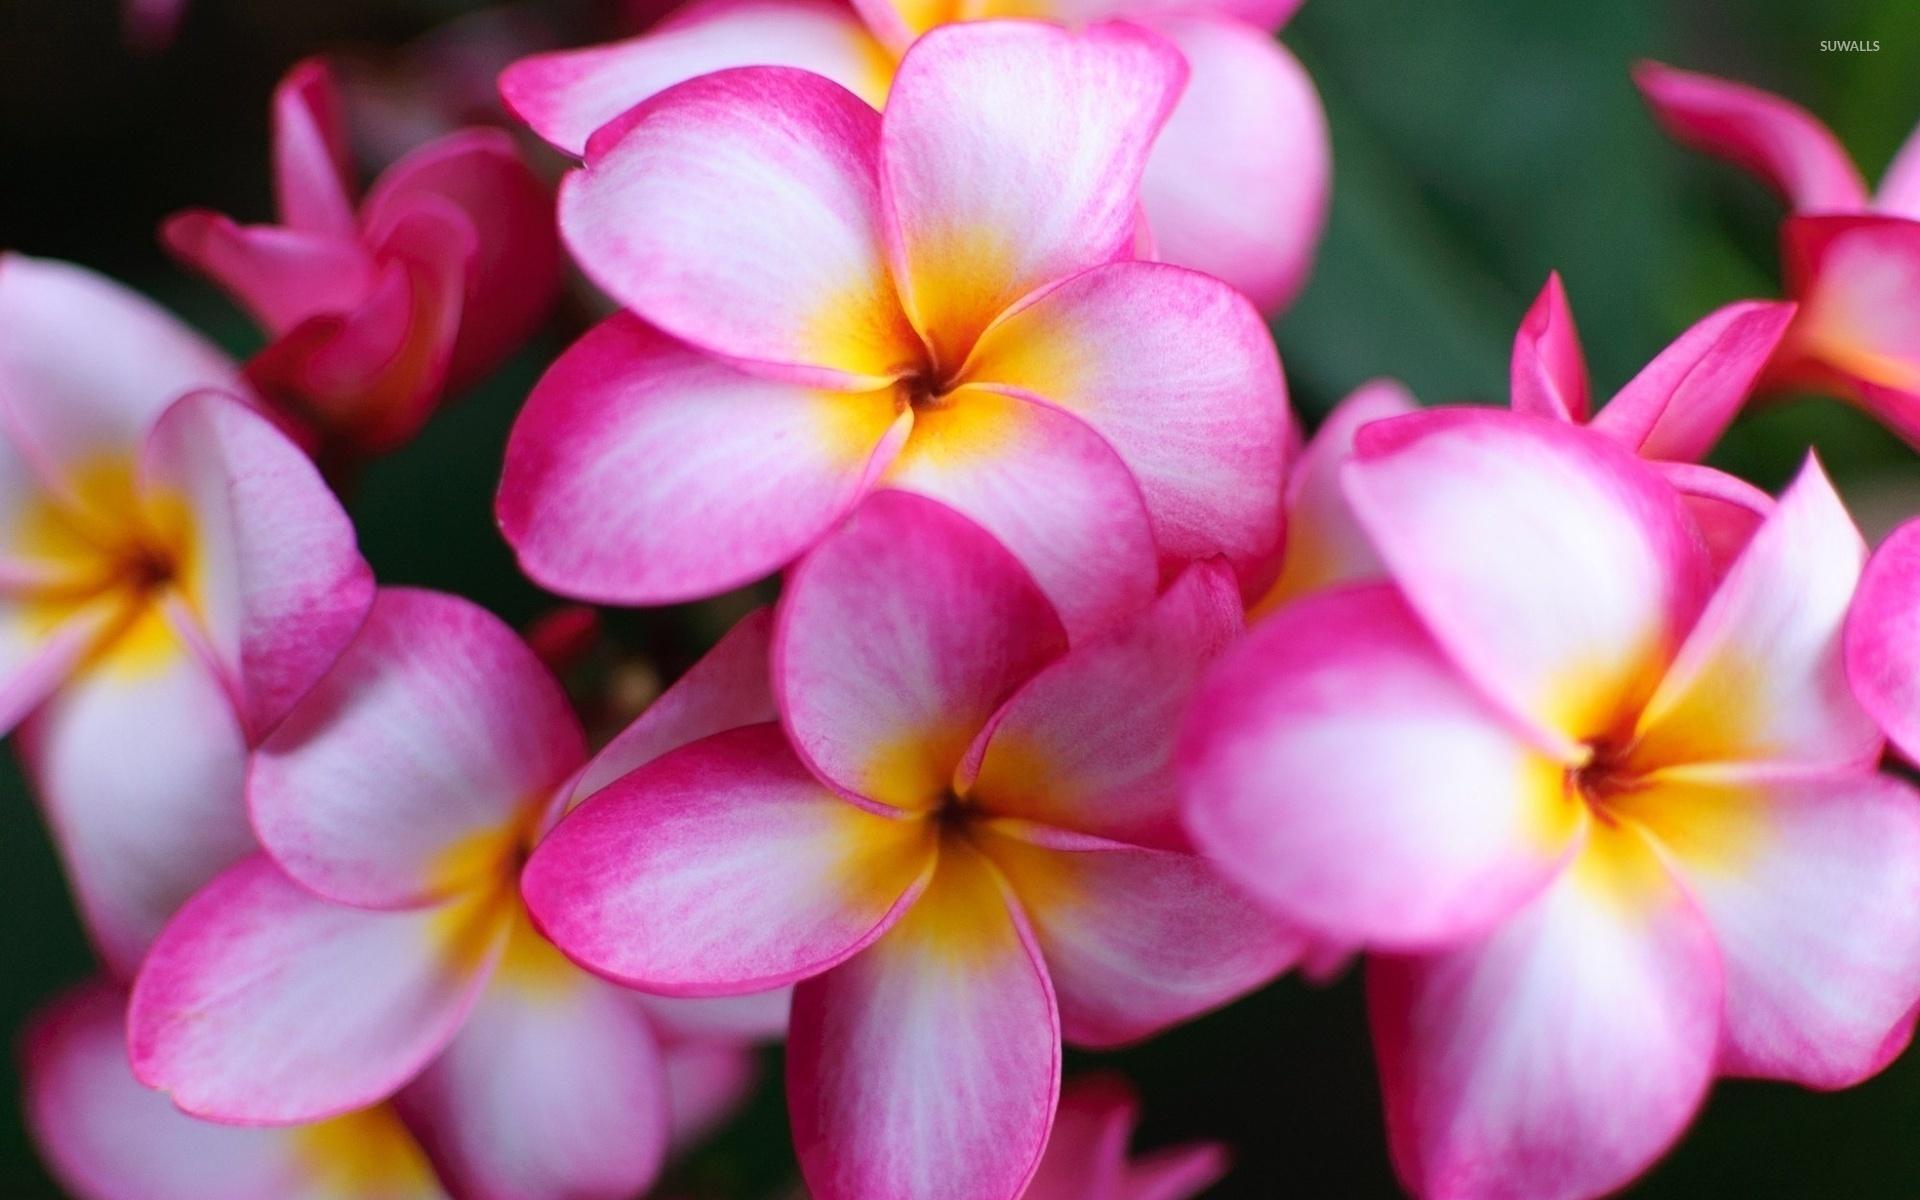 Pink plumerias 3 wallpaper flower wallpapers 40213 pink plumerias 3 wallpaper mightylinksfo